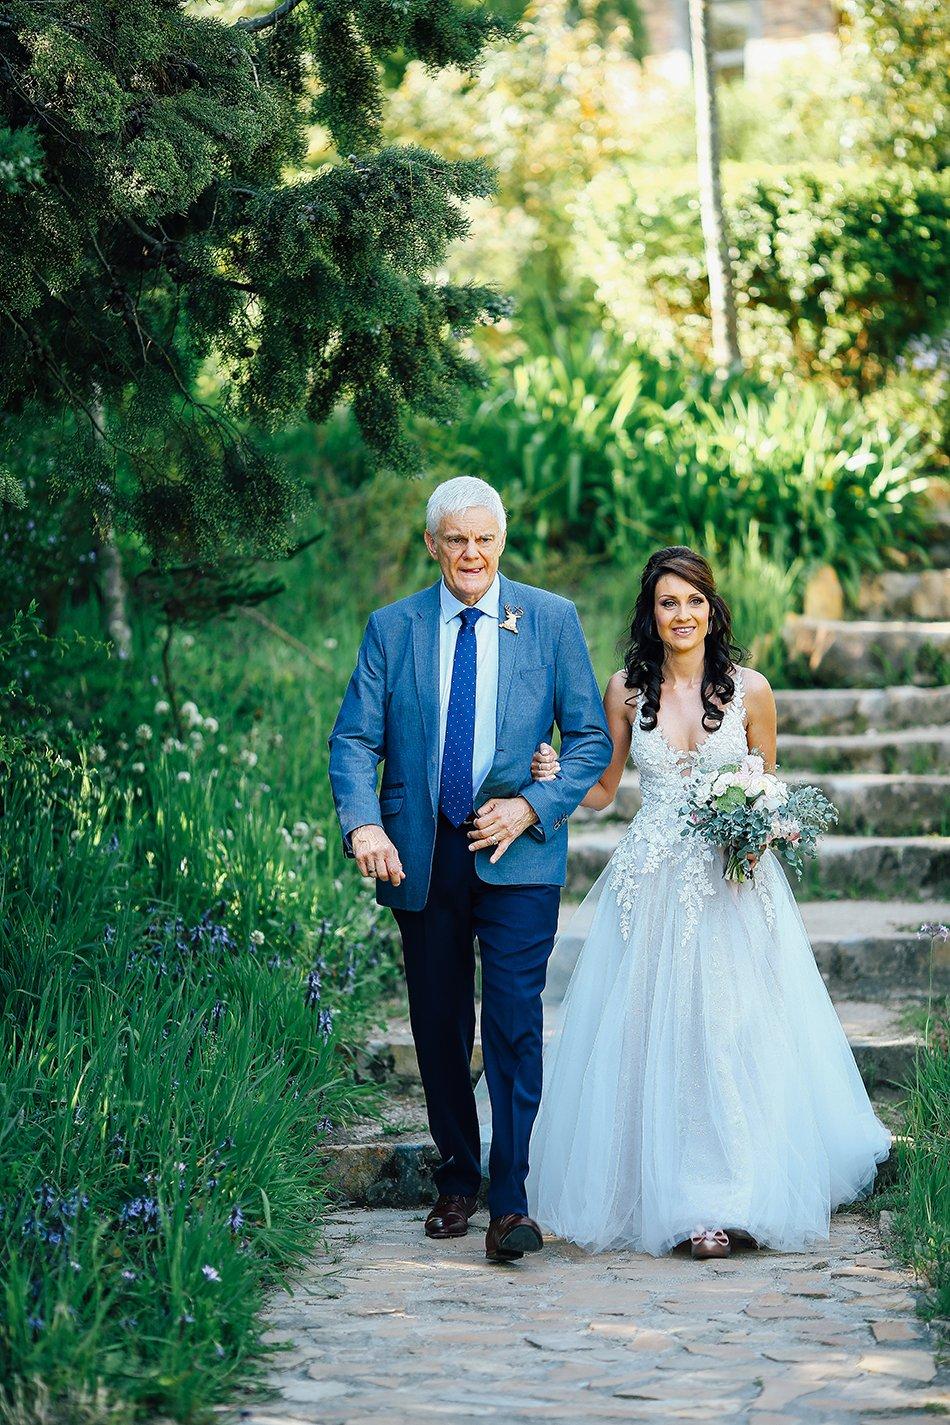 Michelle&Waldi -- Married@Old Mac Daddy, Elgin Valley-1001